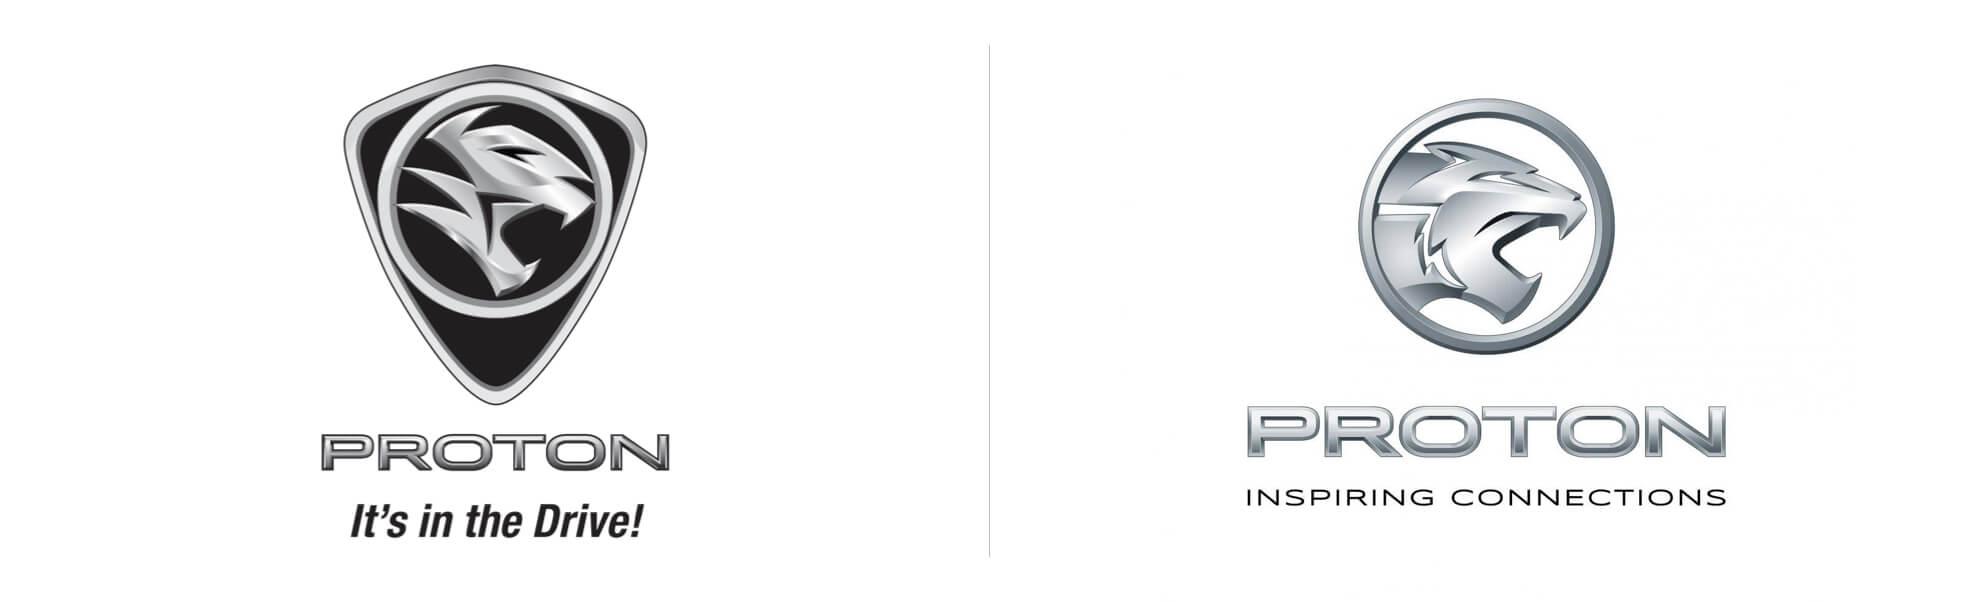 stare inowe logo protona